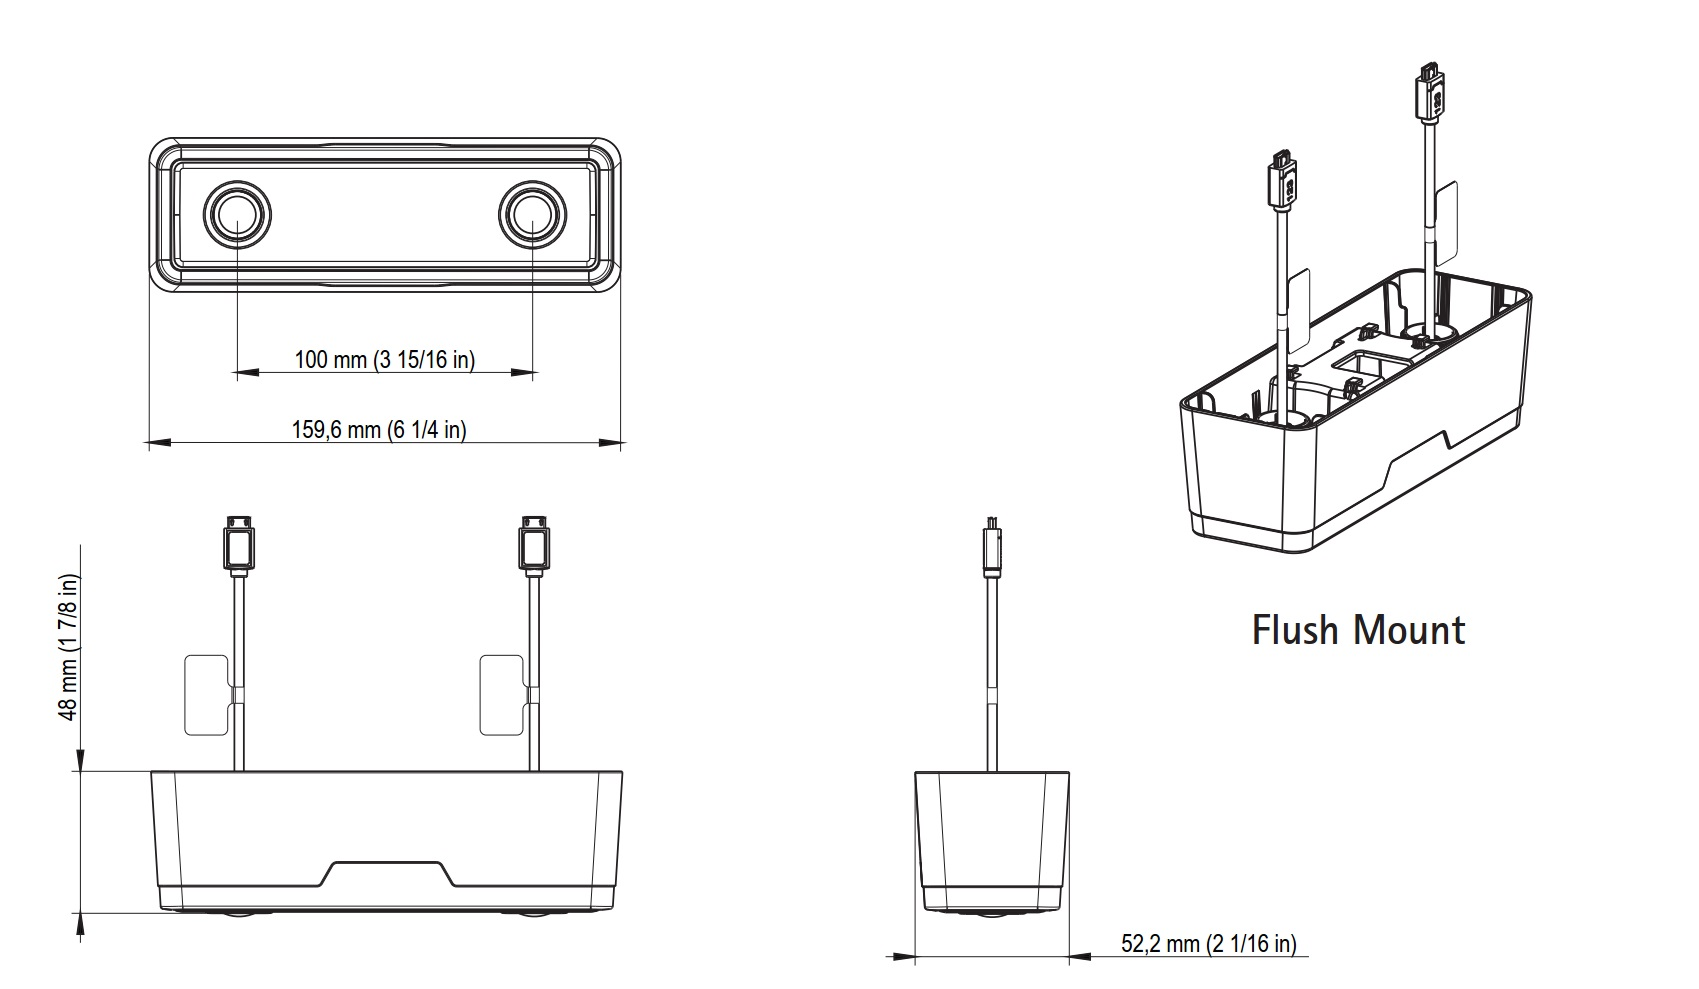 F8804 Flush Mount Dimensions